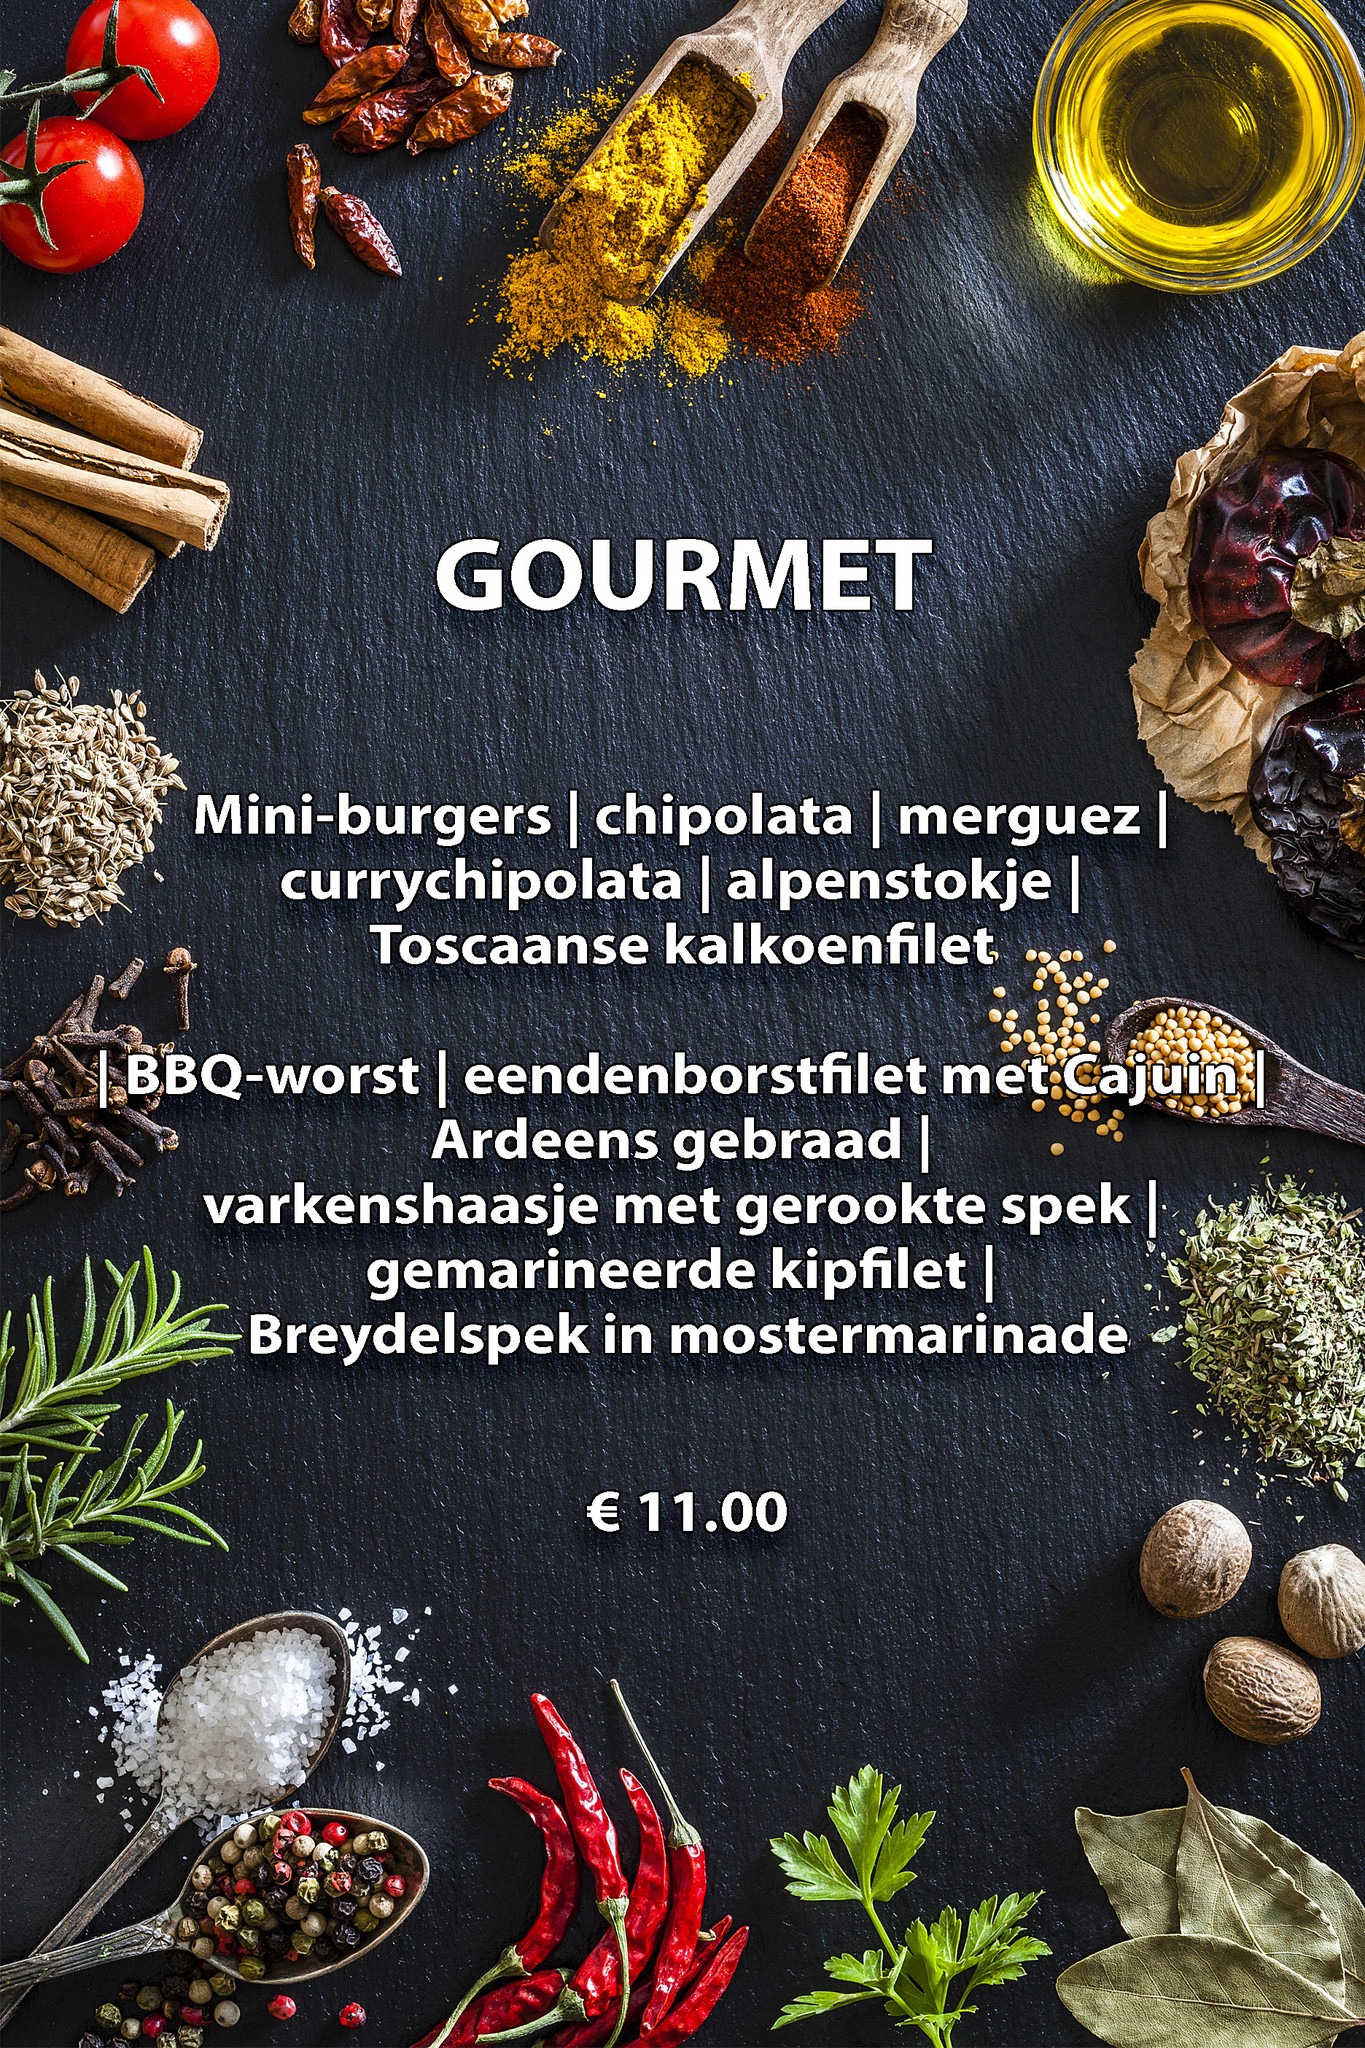 Gourmet-1